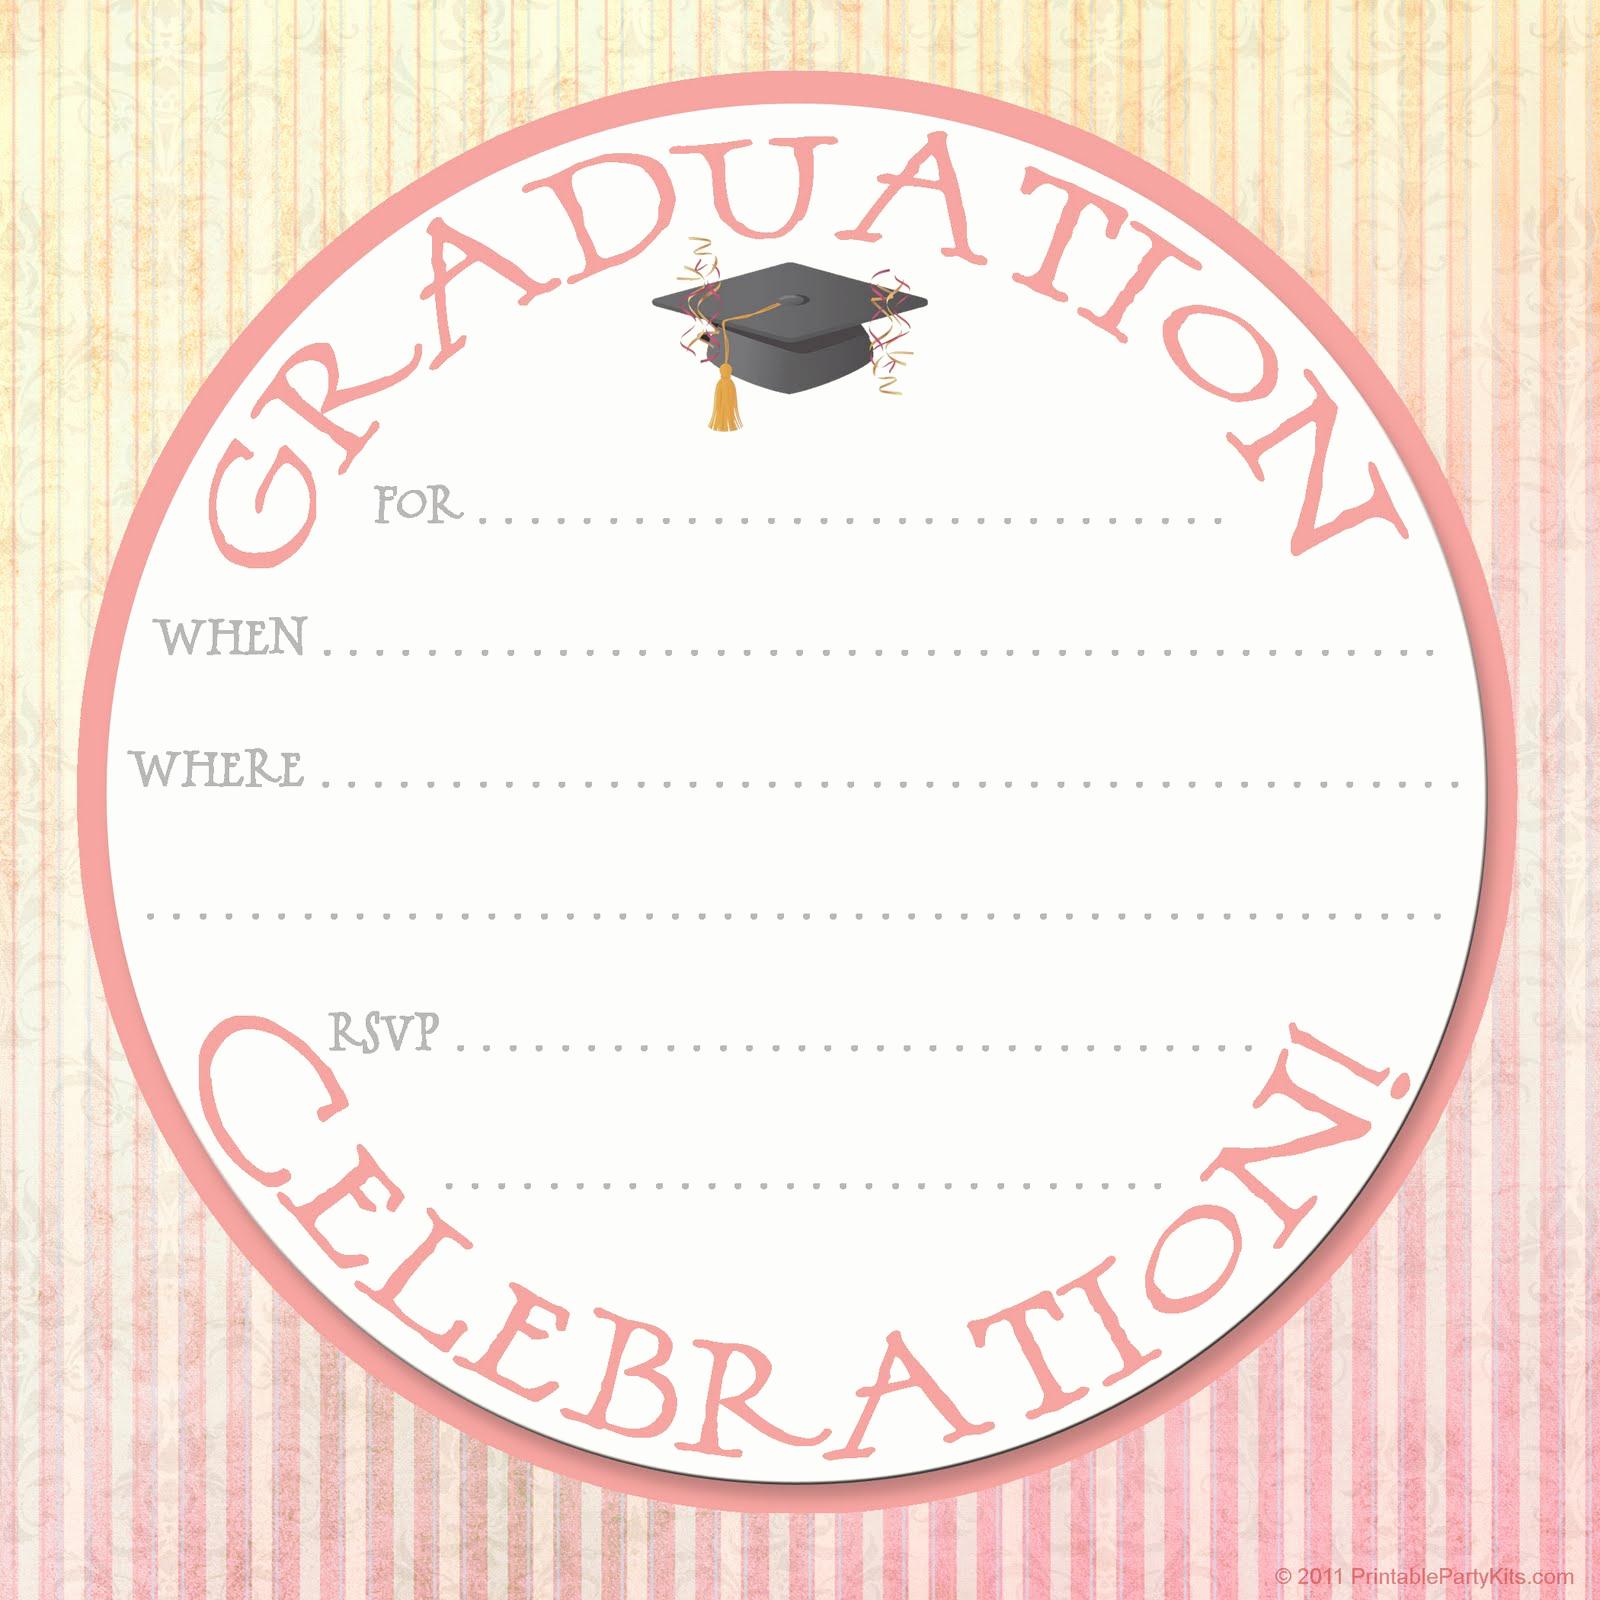 Graduation Invitation Designs Free Elegant Free Printable Party Invitations Graduation Party